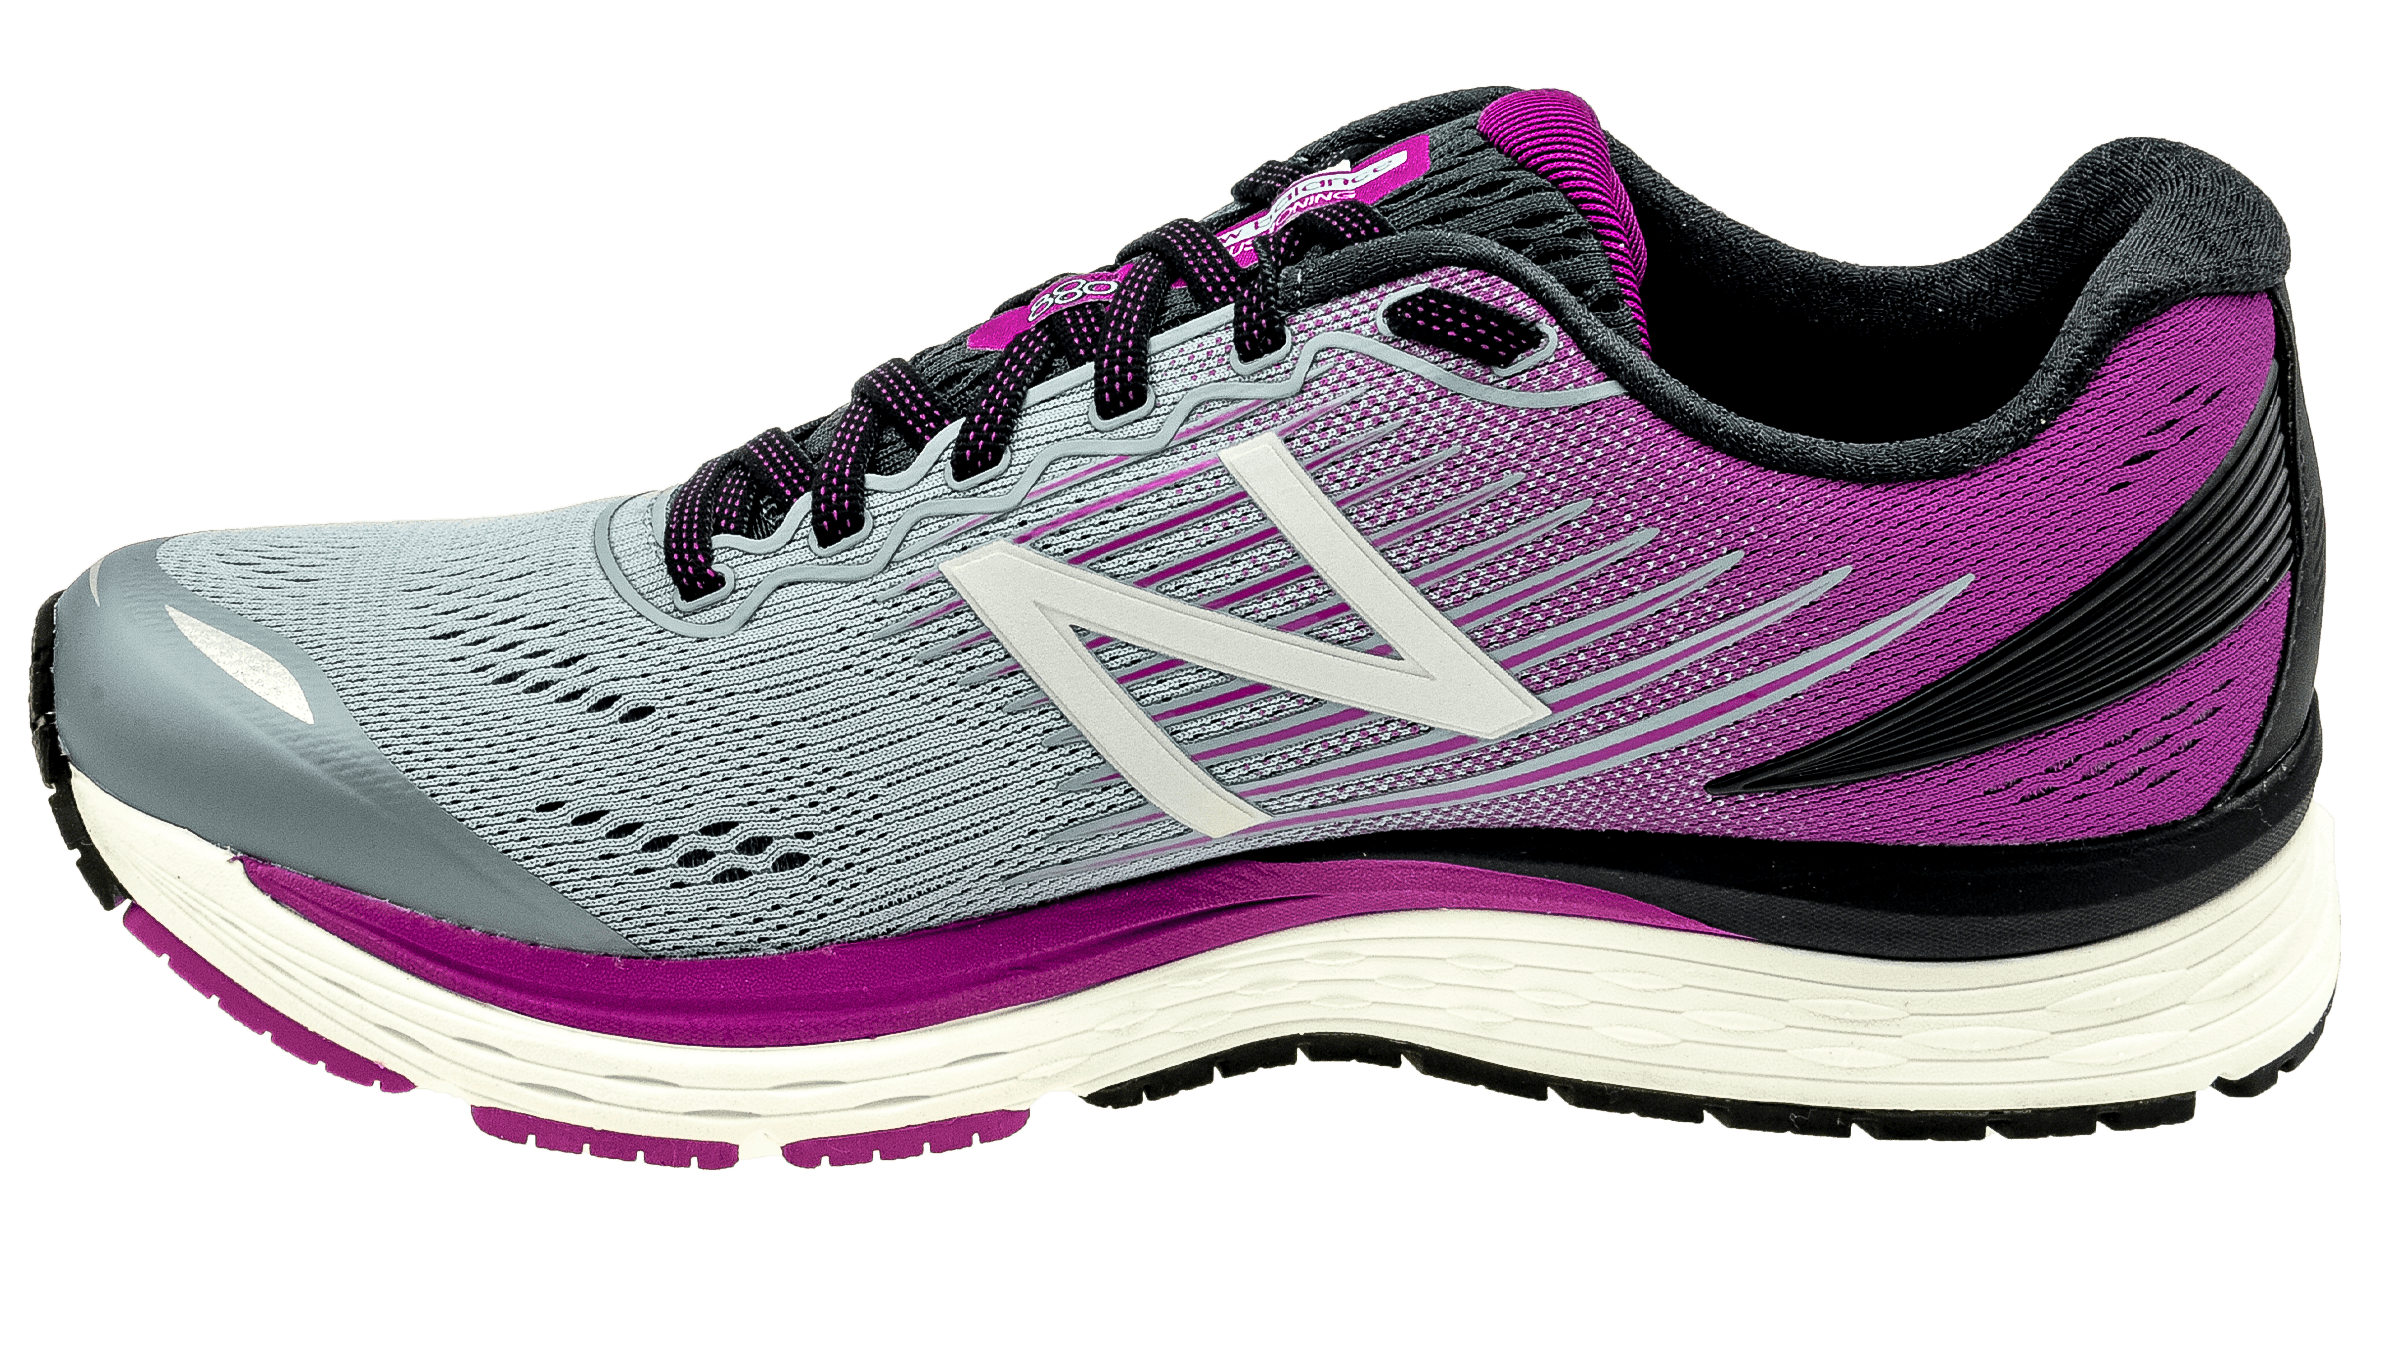 new balance 880 v8